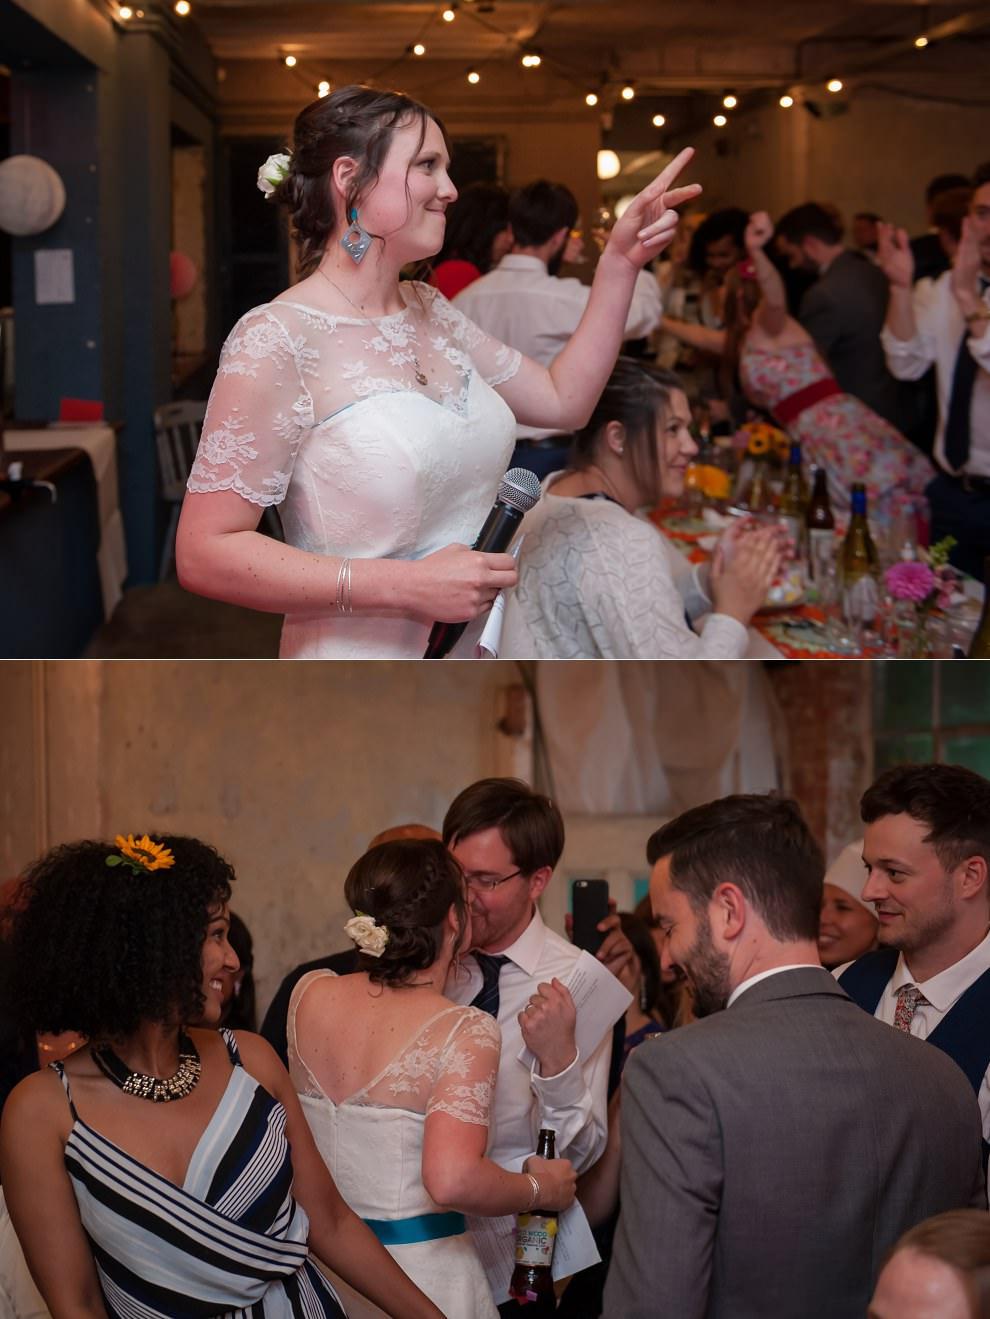 Bride giving speech at wedding